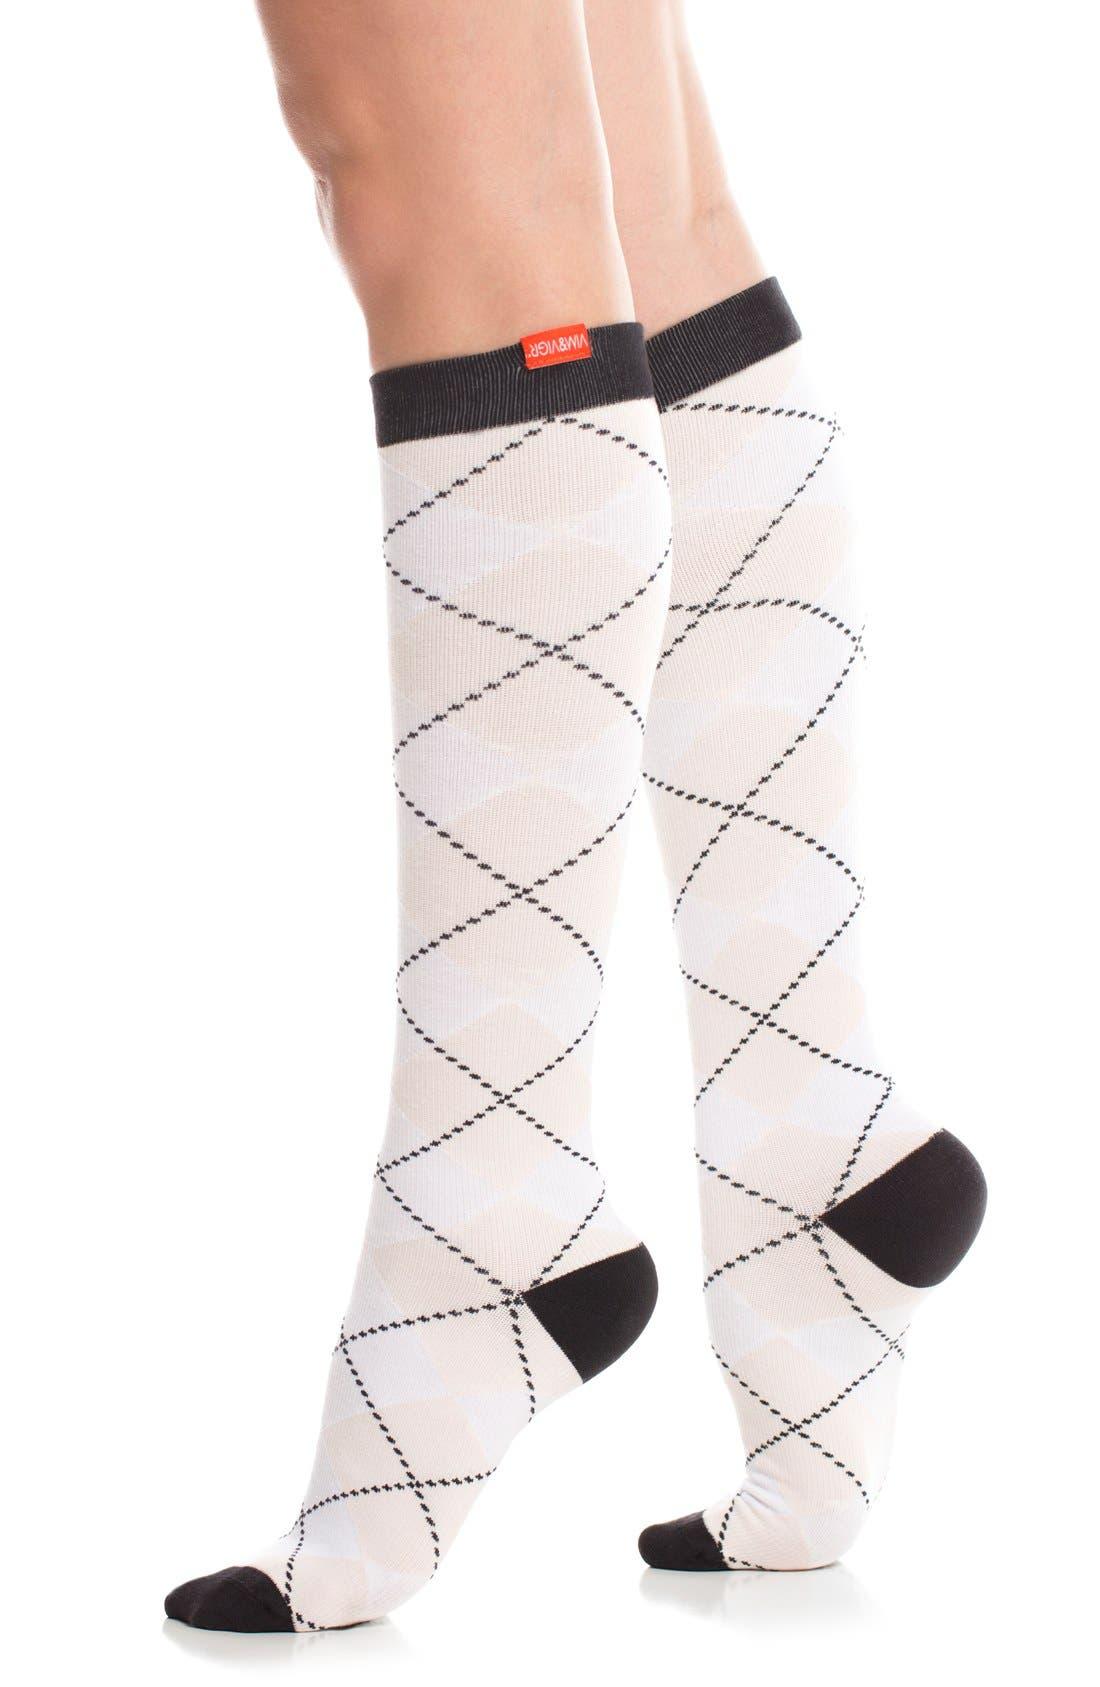 Argyle Graduated Compression Trouser Socks,                         Main,                         color, 101